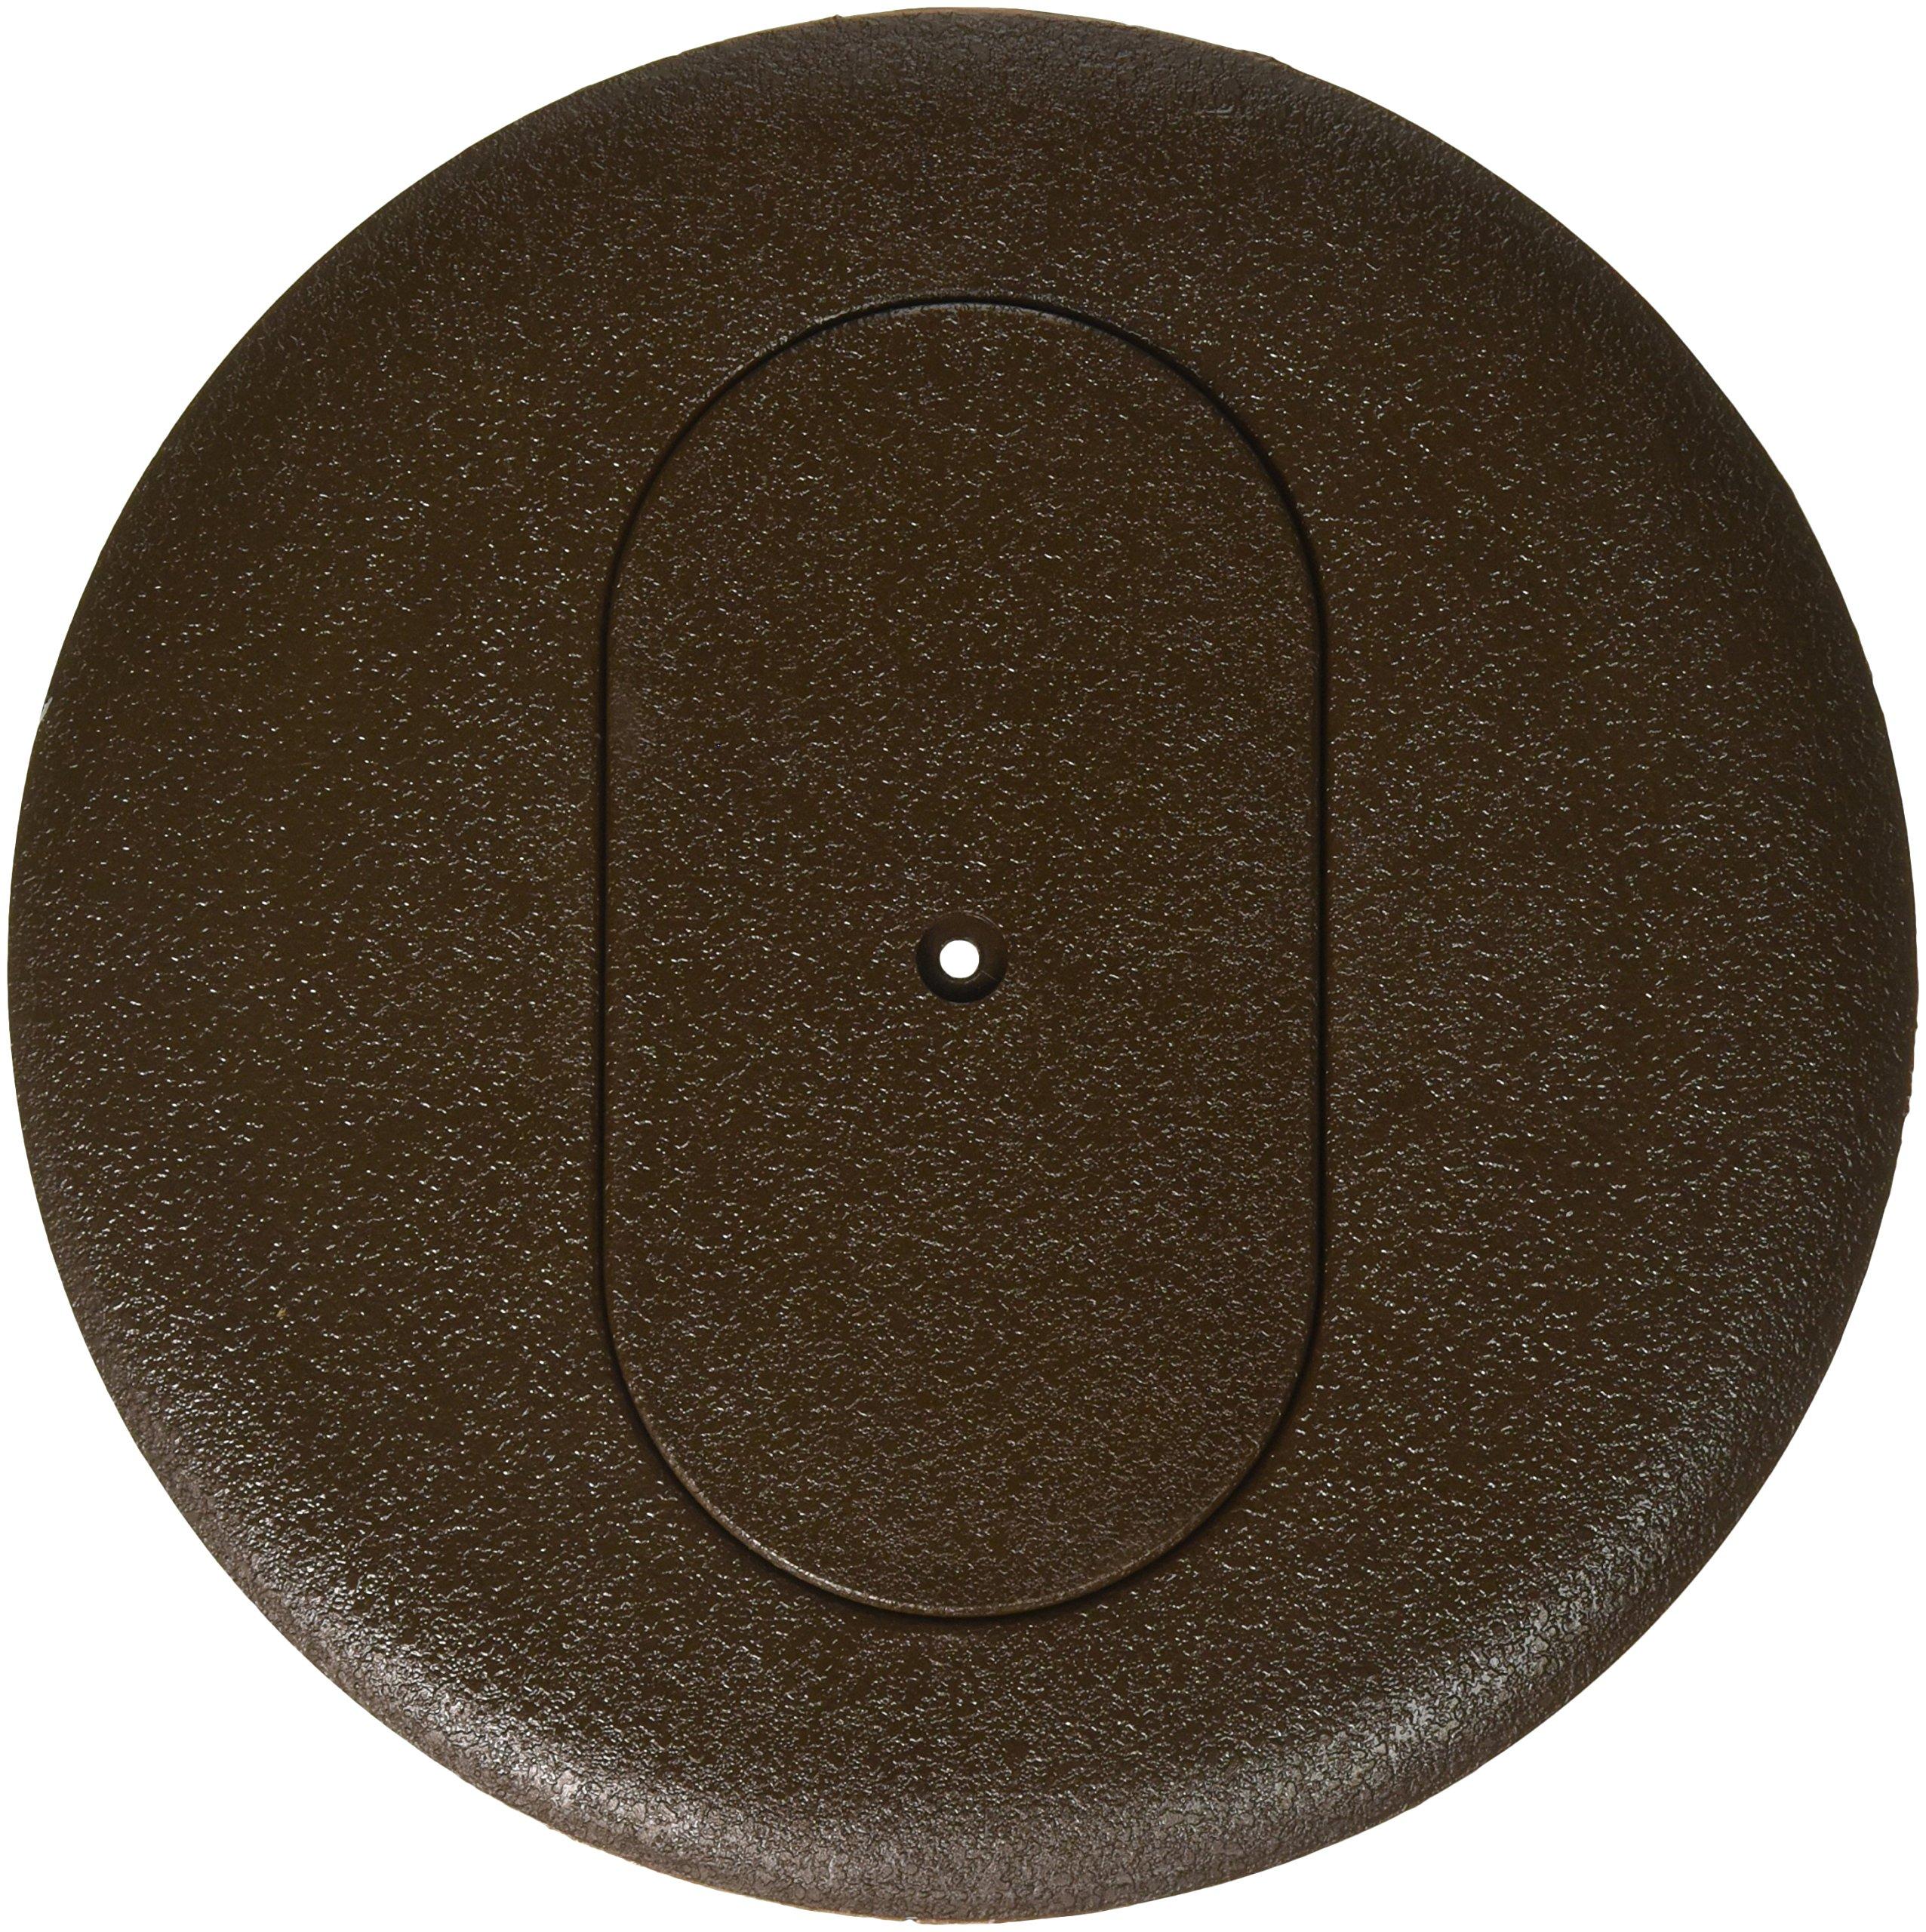 Thomas & Betts P-68-DRC-BRN Steel City MopTite Non-Metallic Carpet Plate and Cover for Duplex Receptacle, 6'' Diameter, Brown